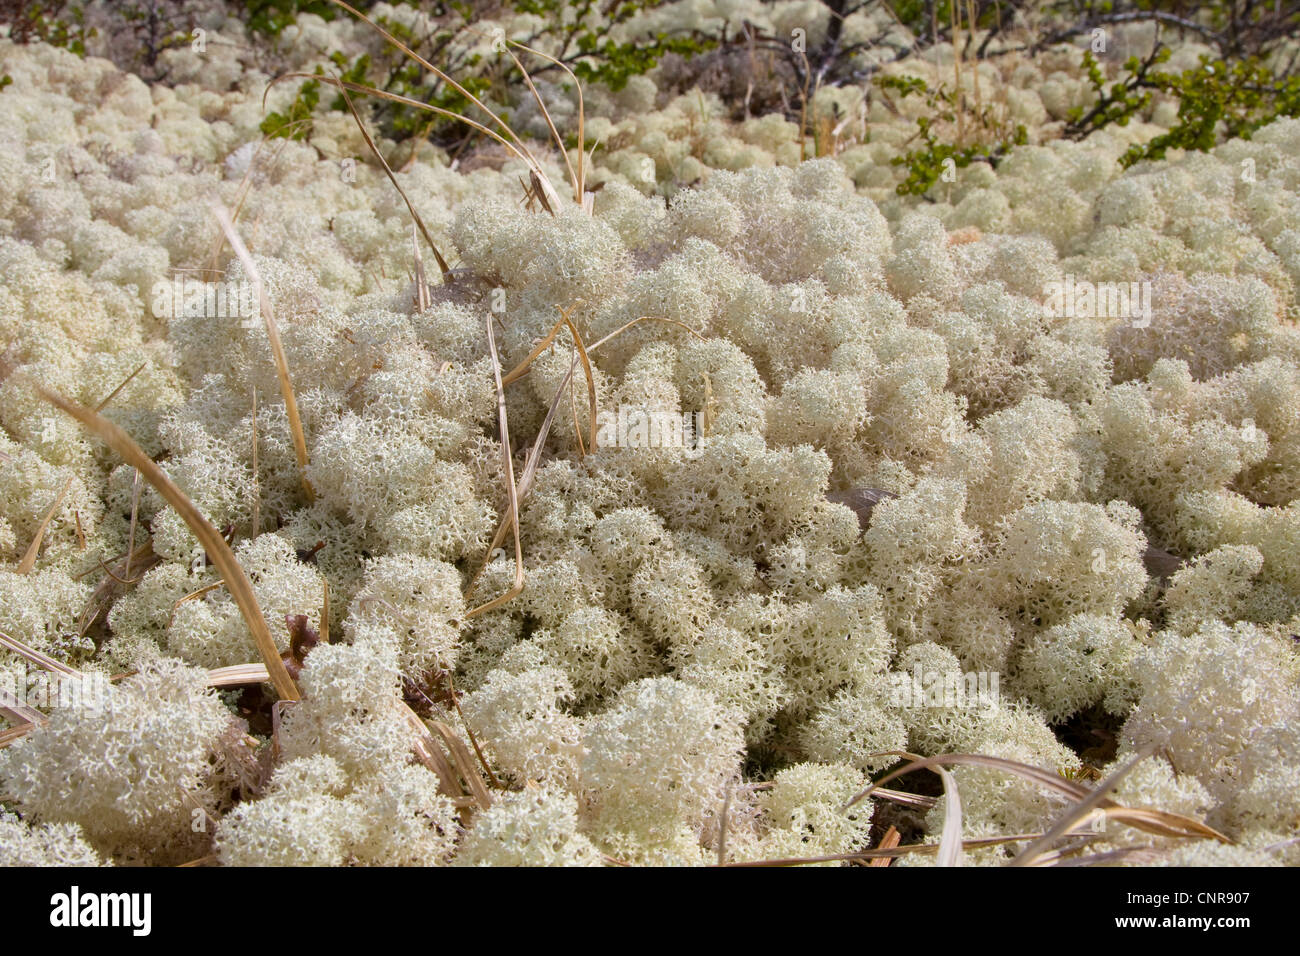 star-tipped reindeer lichen (Cladonia stellaris), group, Norway, Opdal - Stock Image